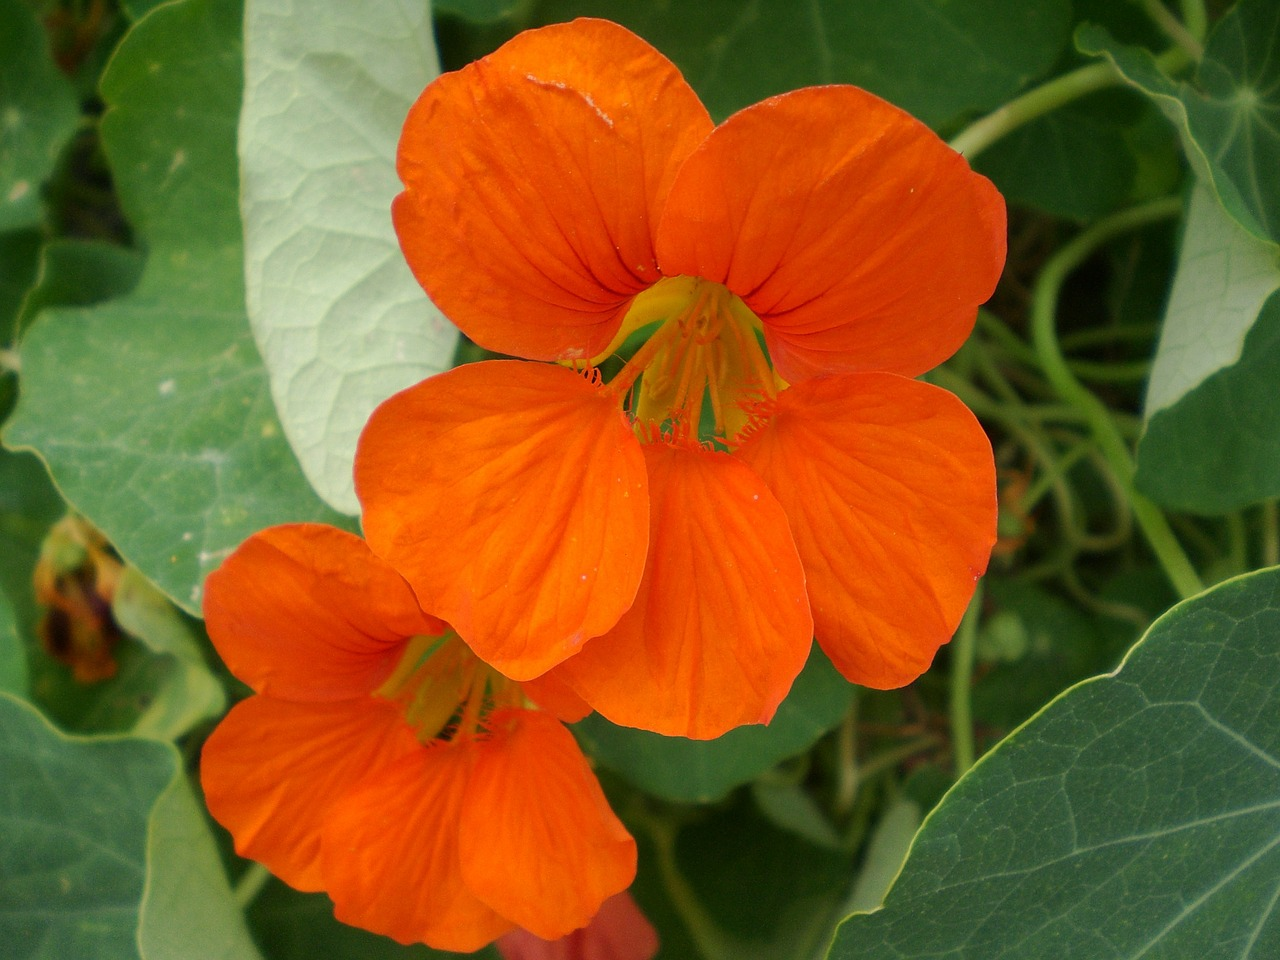 Nasturtiums brighten up any corner of the garden.